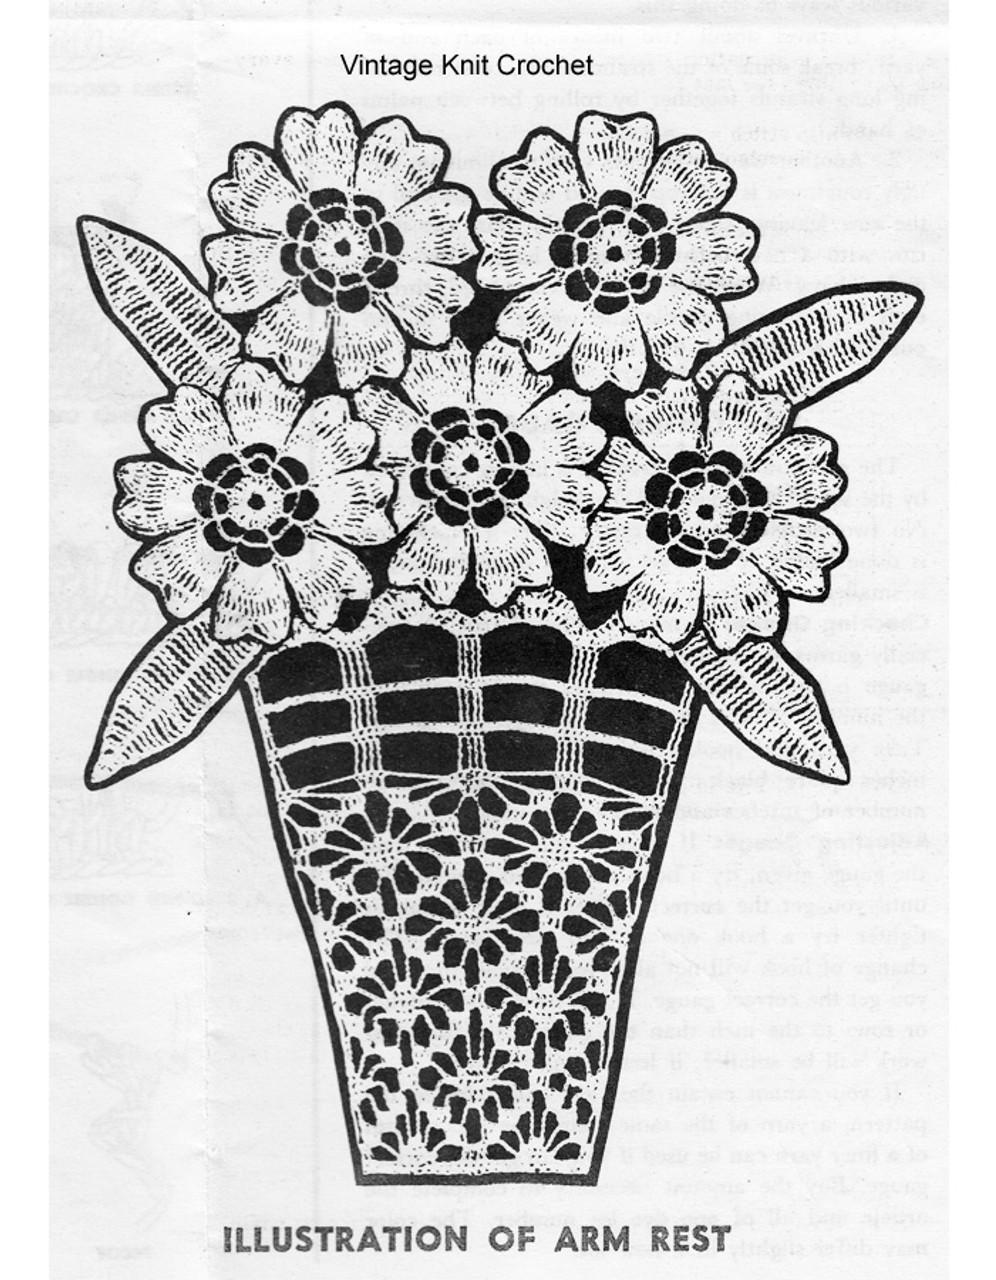 Daisy Crochet Arm Rest Illustration, Mail Order 912